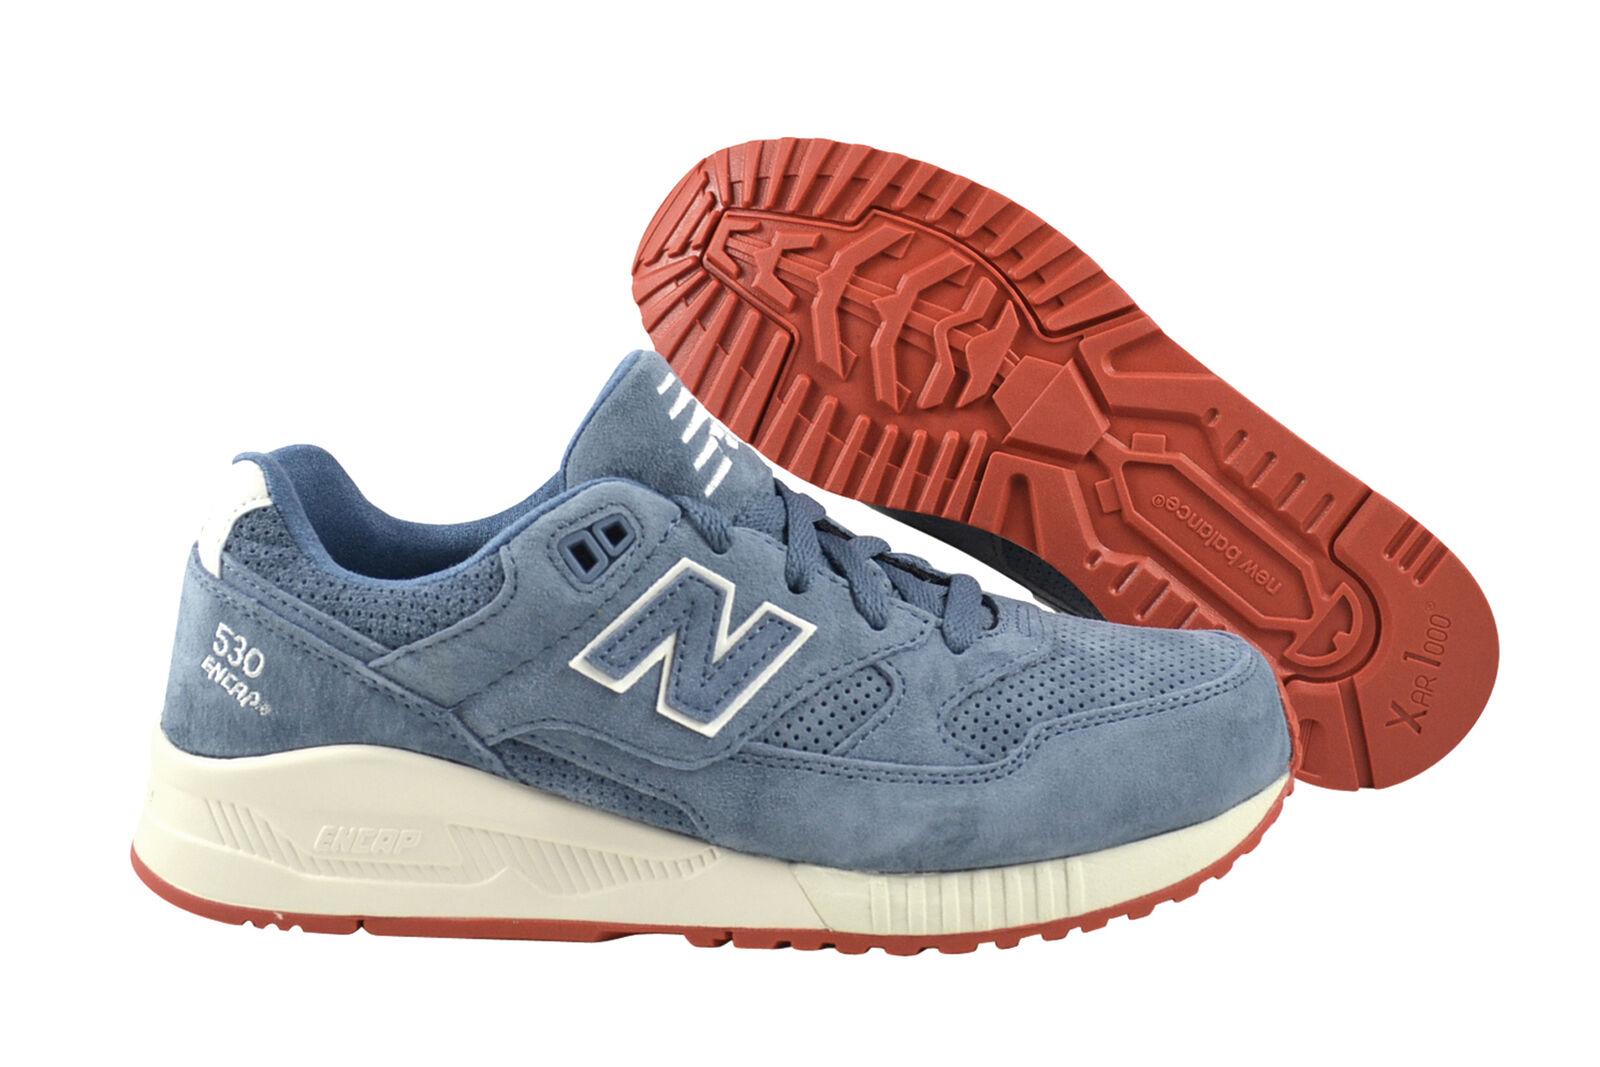 New Balance M530 VCB Blau Schuhe Turnschuhe blau